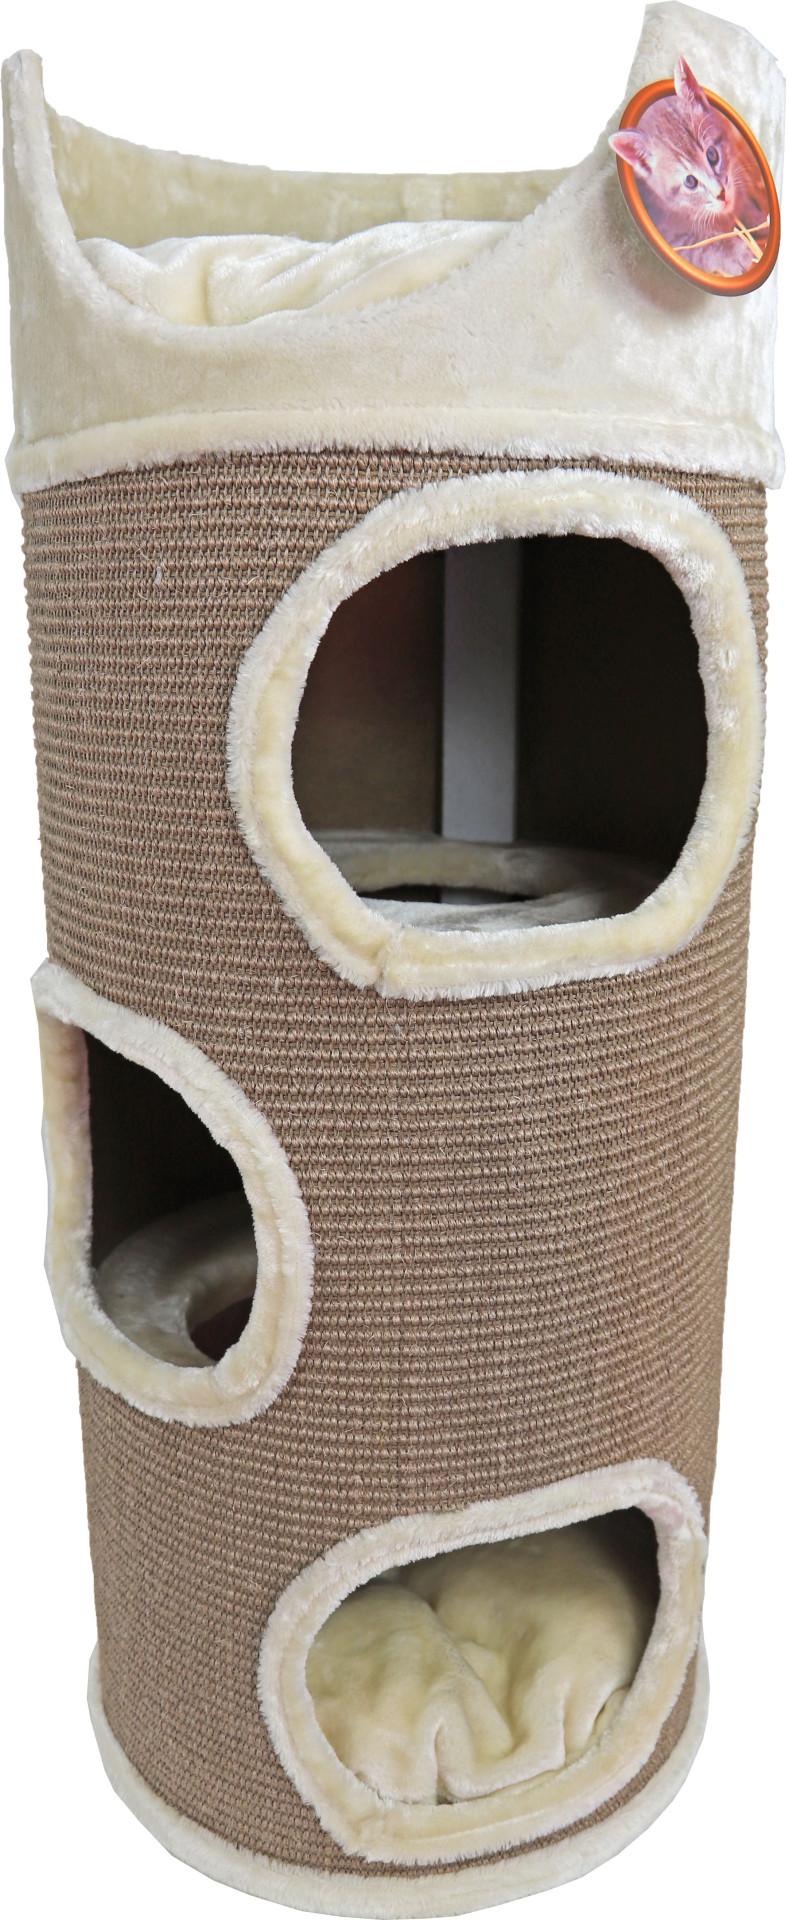 Krabton sisal met zit<br>3-gaats taupe/beige<br>100 cm